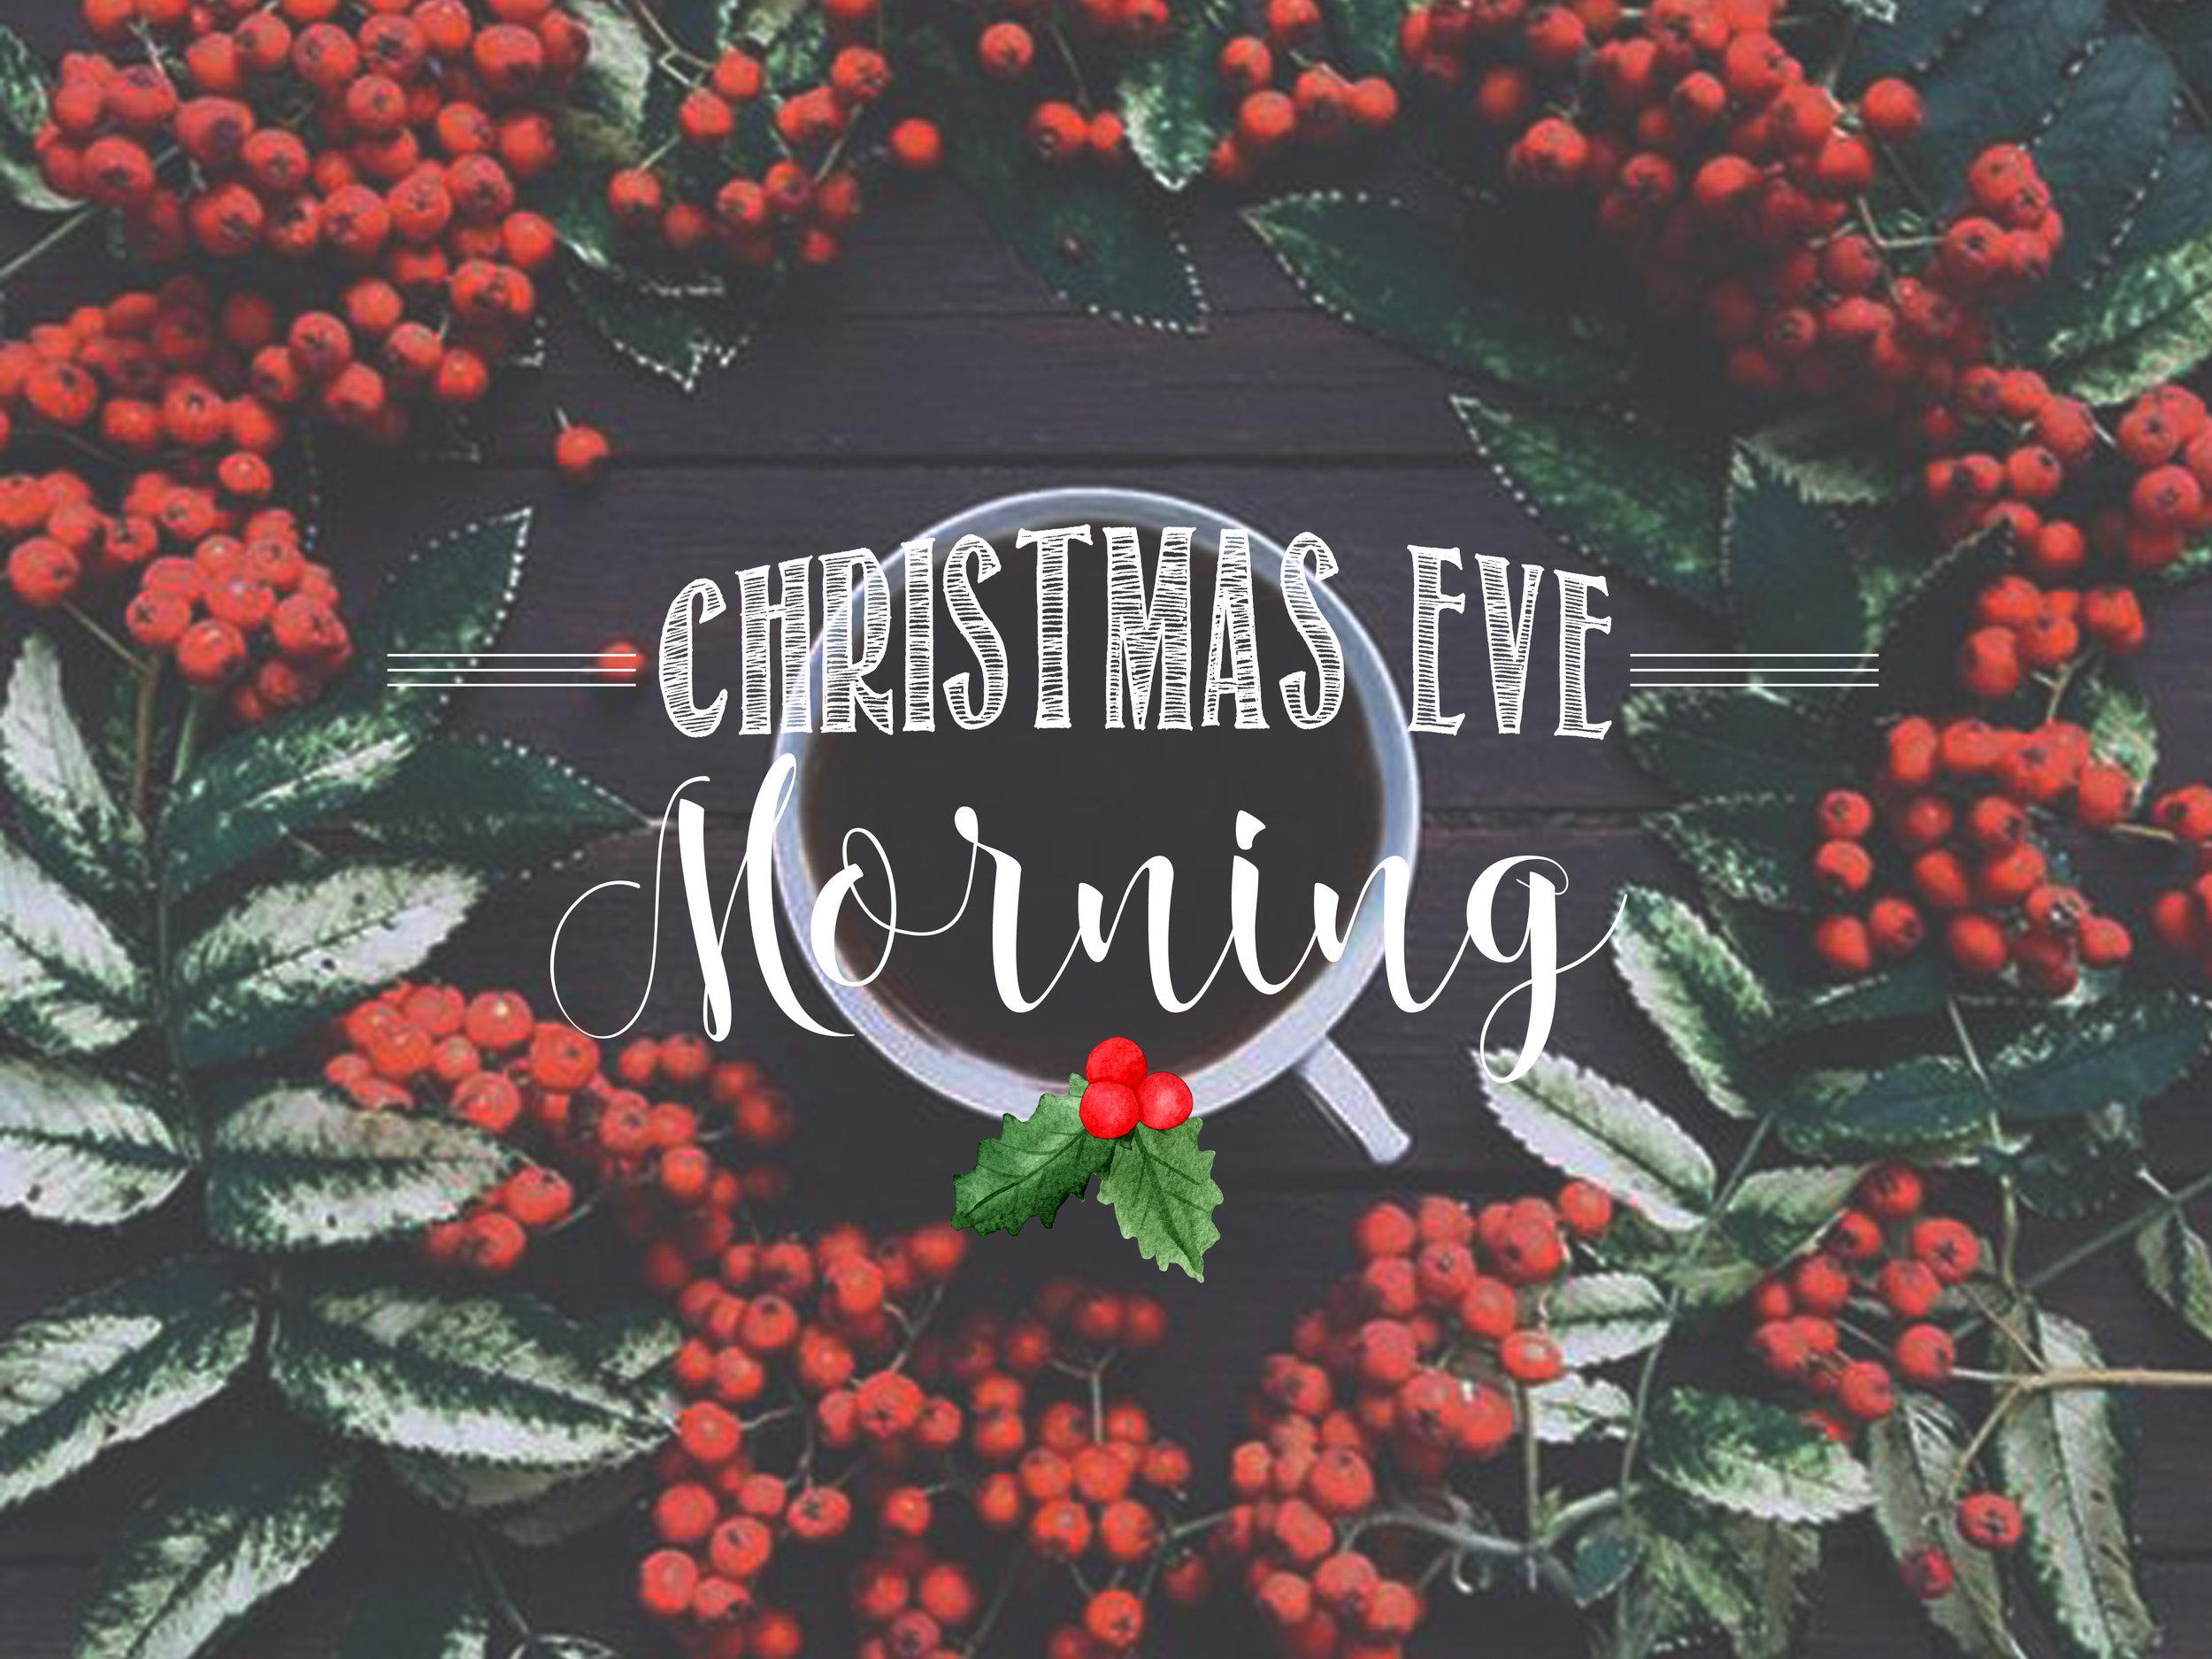 ChristmasEve_Welcome2017.jpg